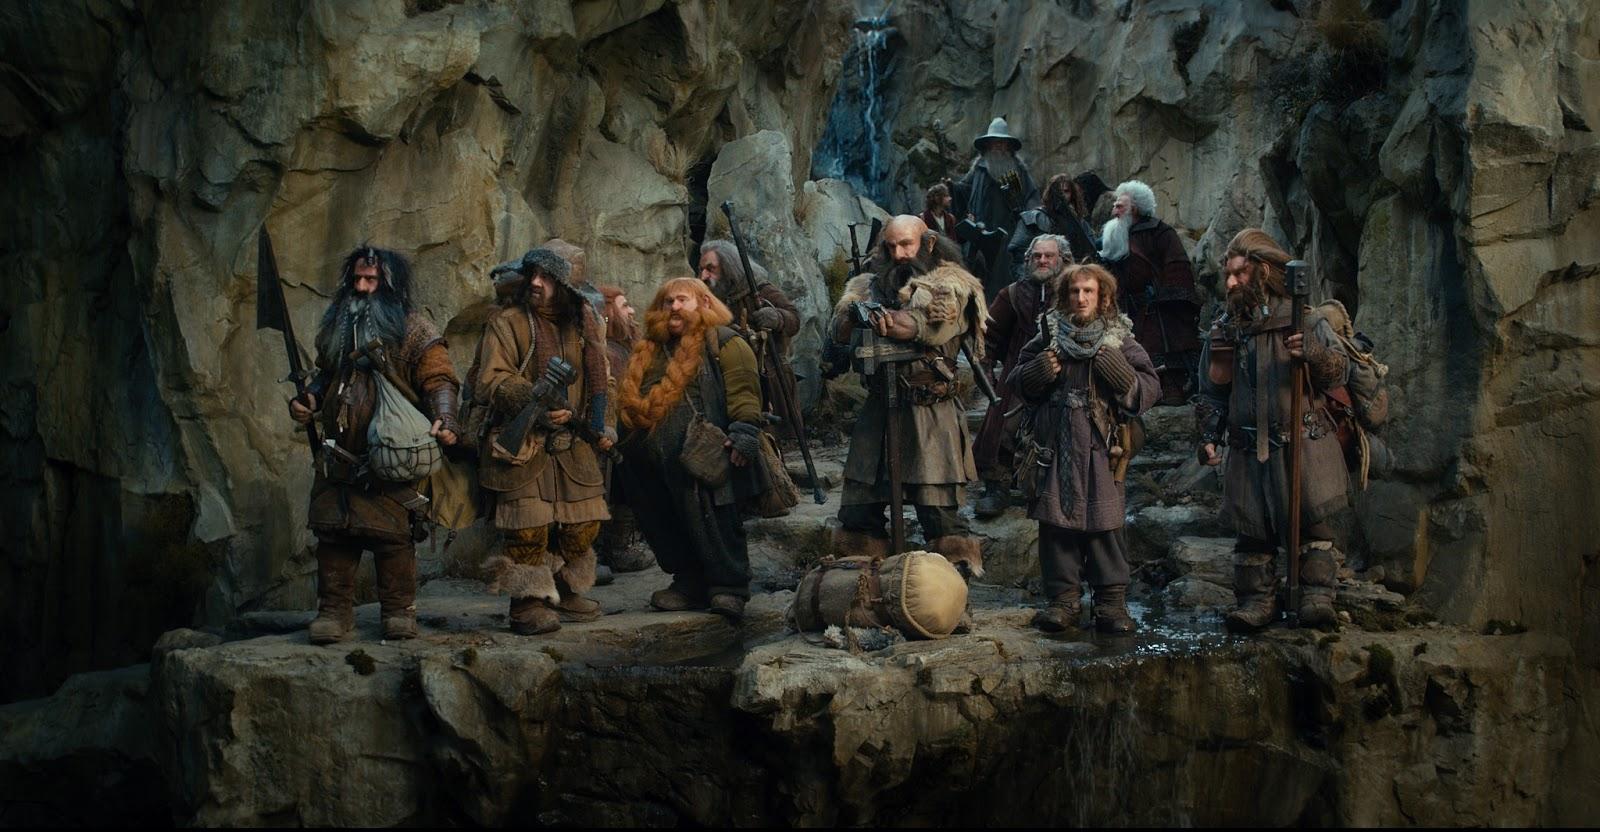 T i e r r a F r e a k: The Hobbit: An Unexpected Journey